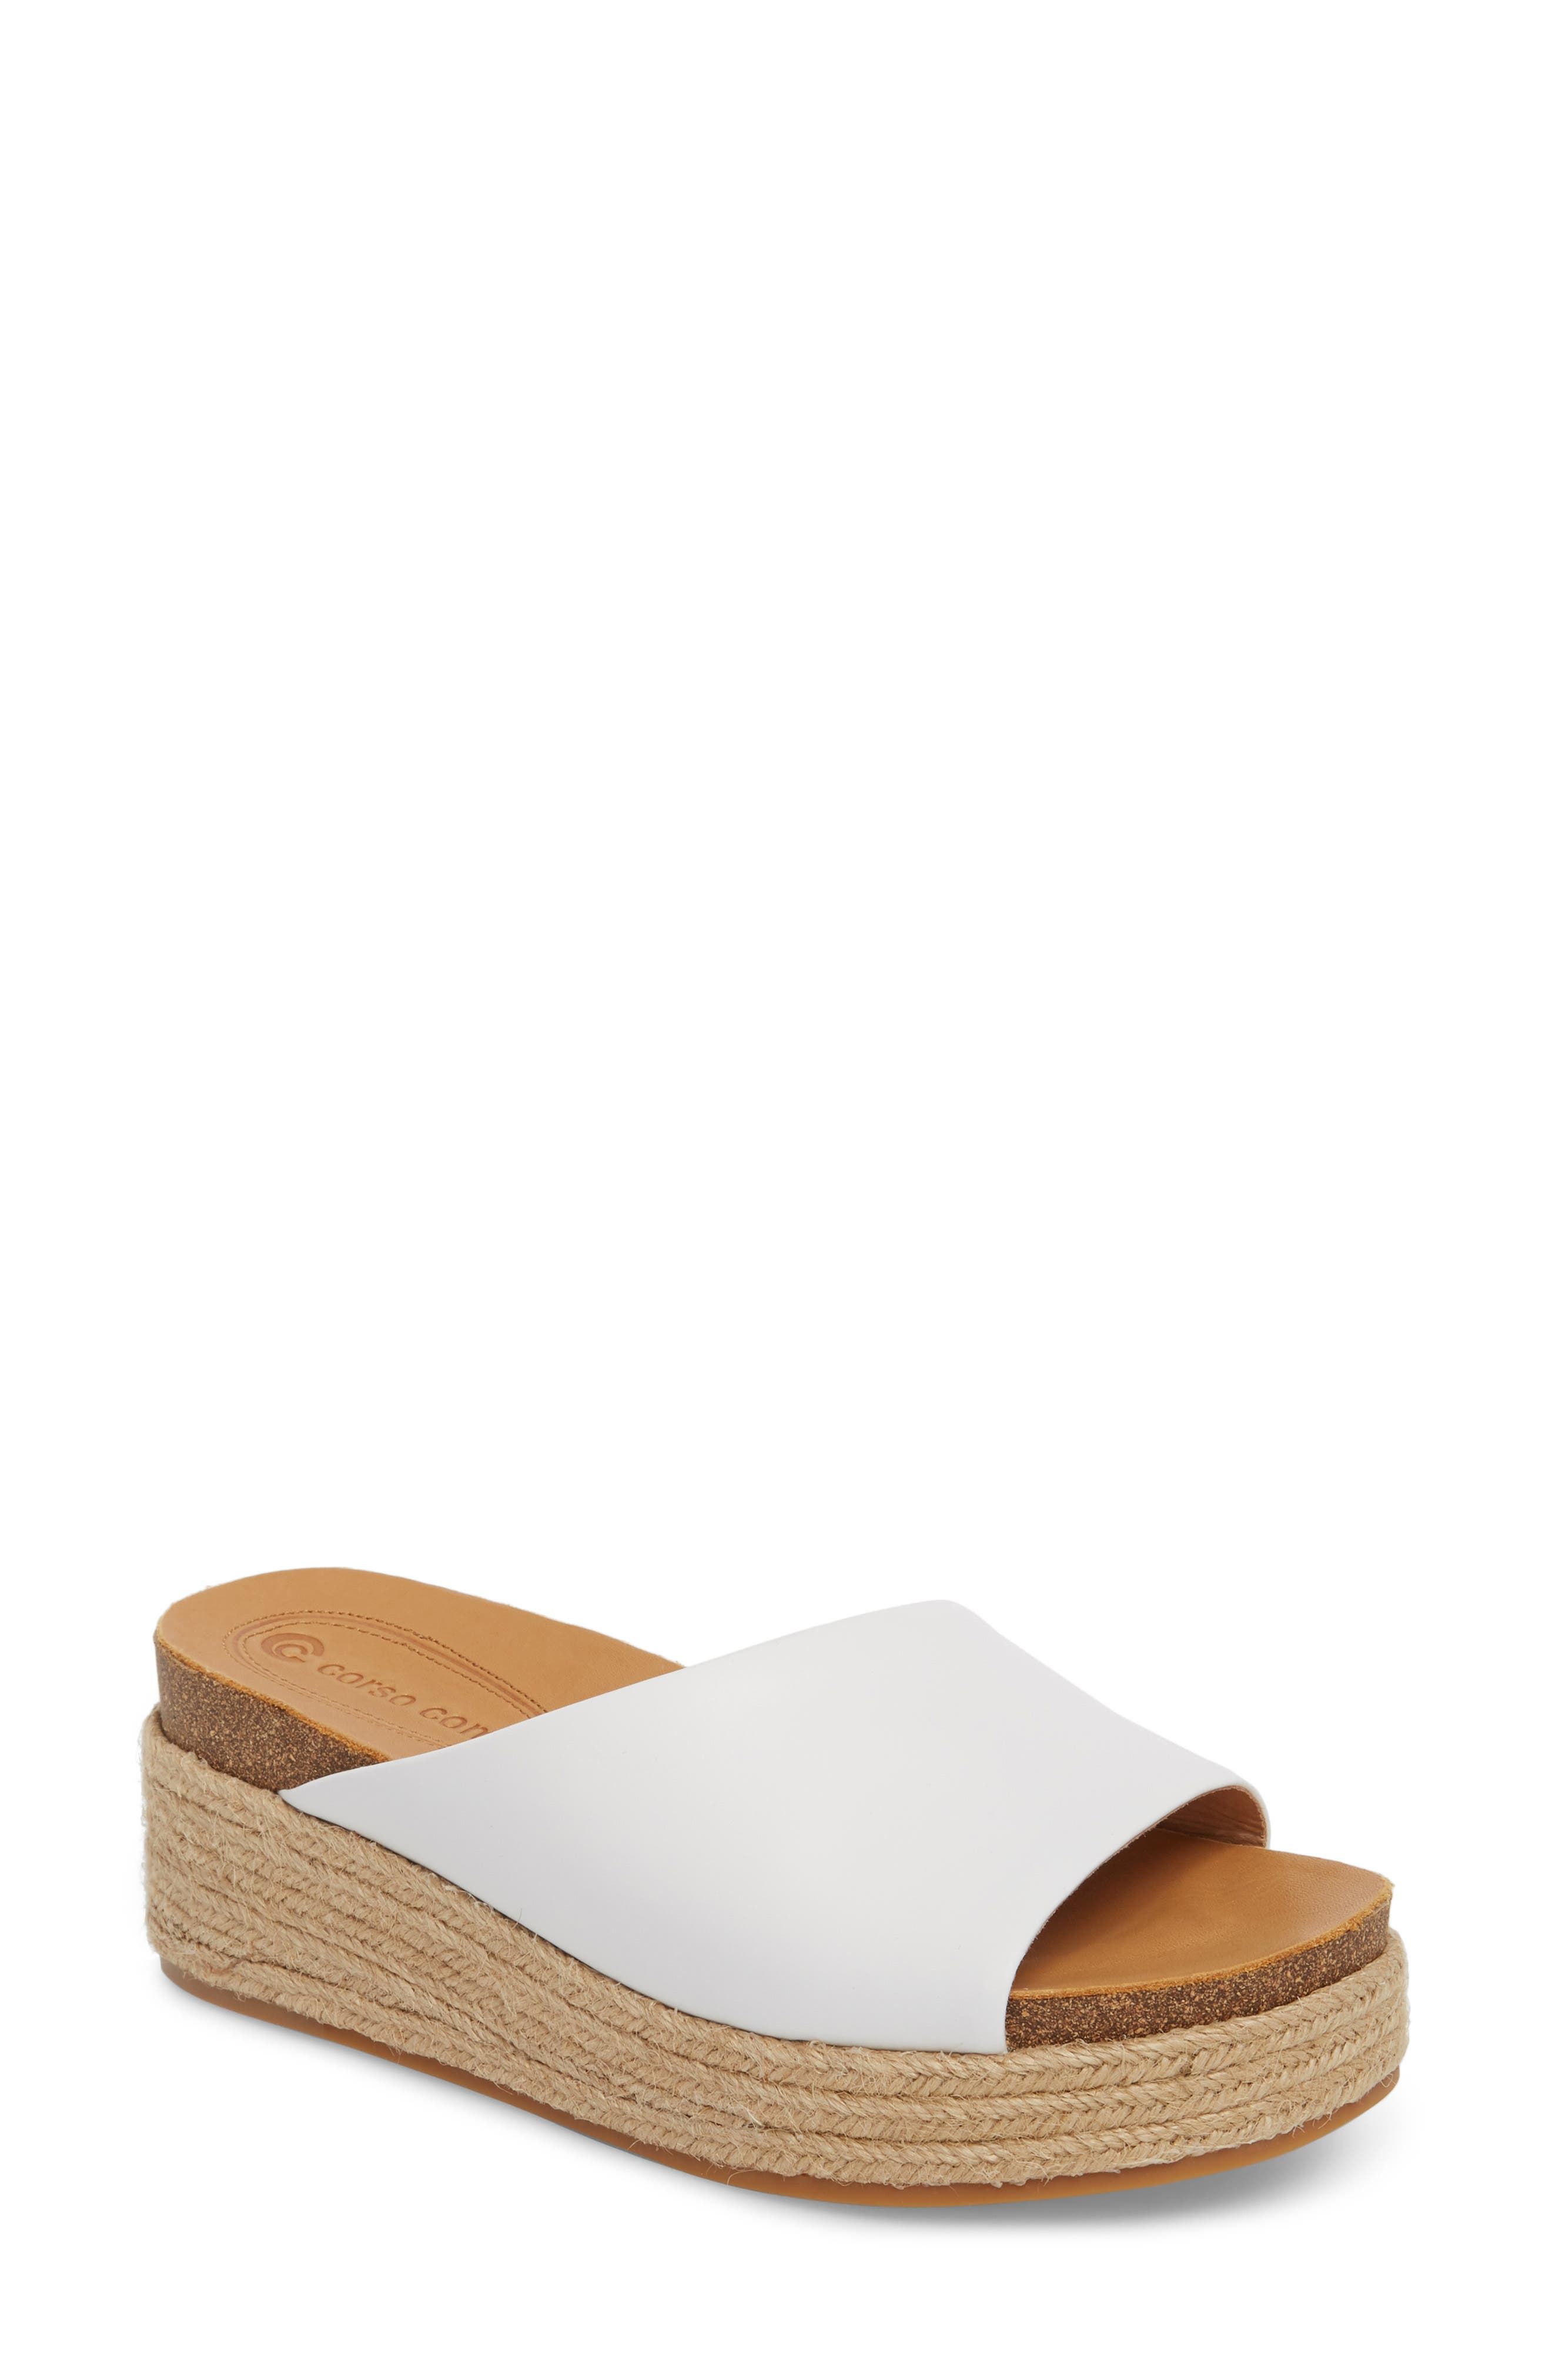 CC CORSO COMO<SUP>®</SUP> Candice Sandal, Main, color, WHITE LEATHER